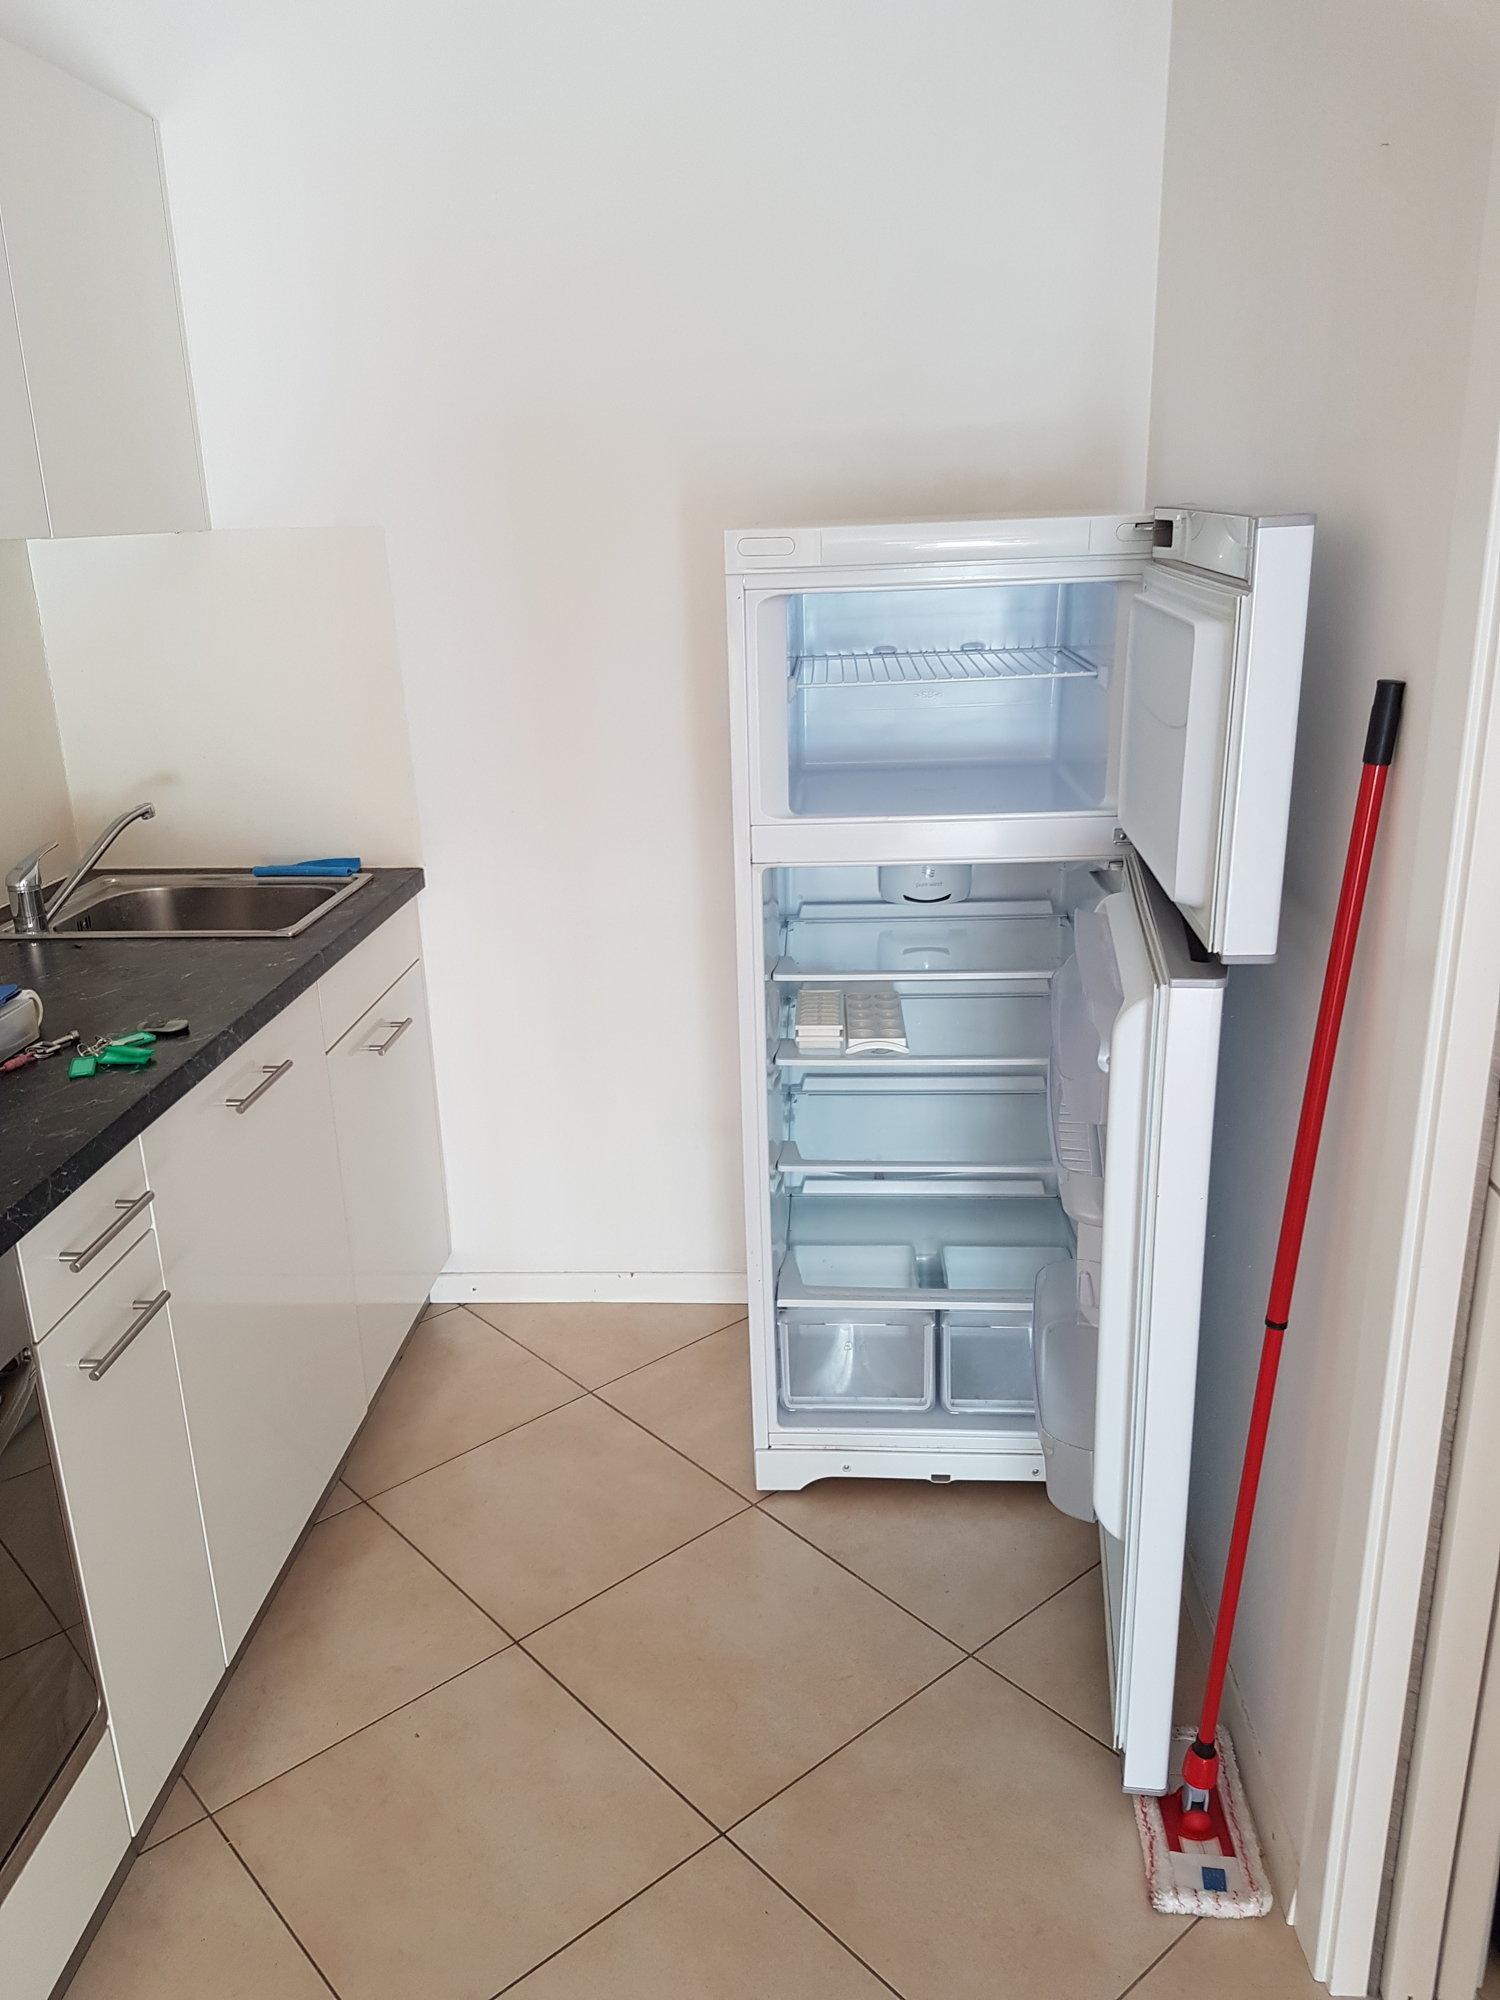 Separater Kühlschrank_frigorifero seperato